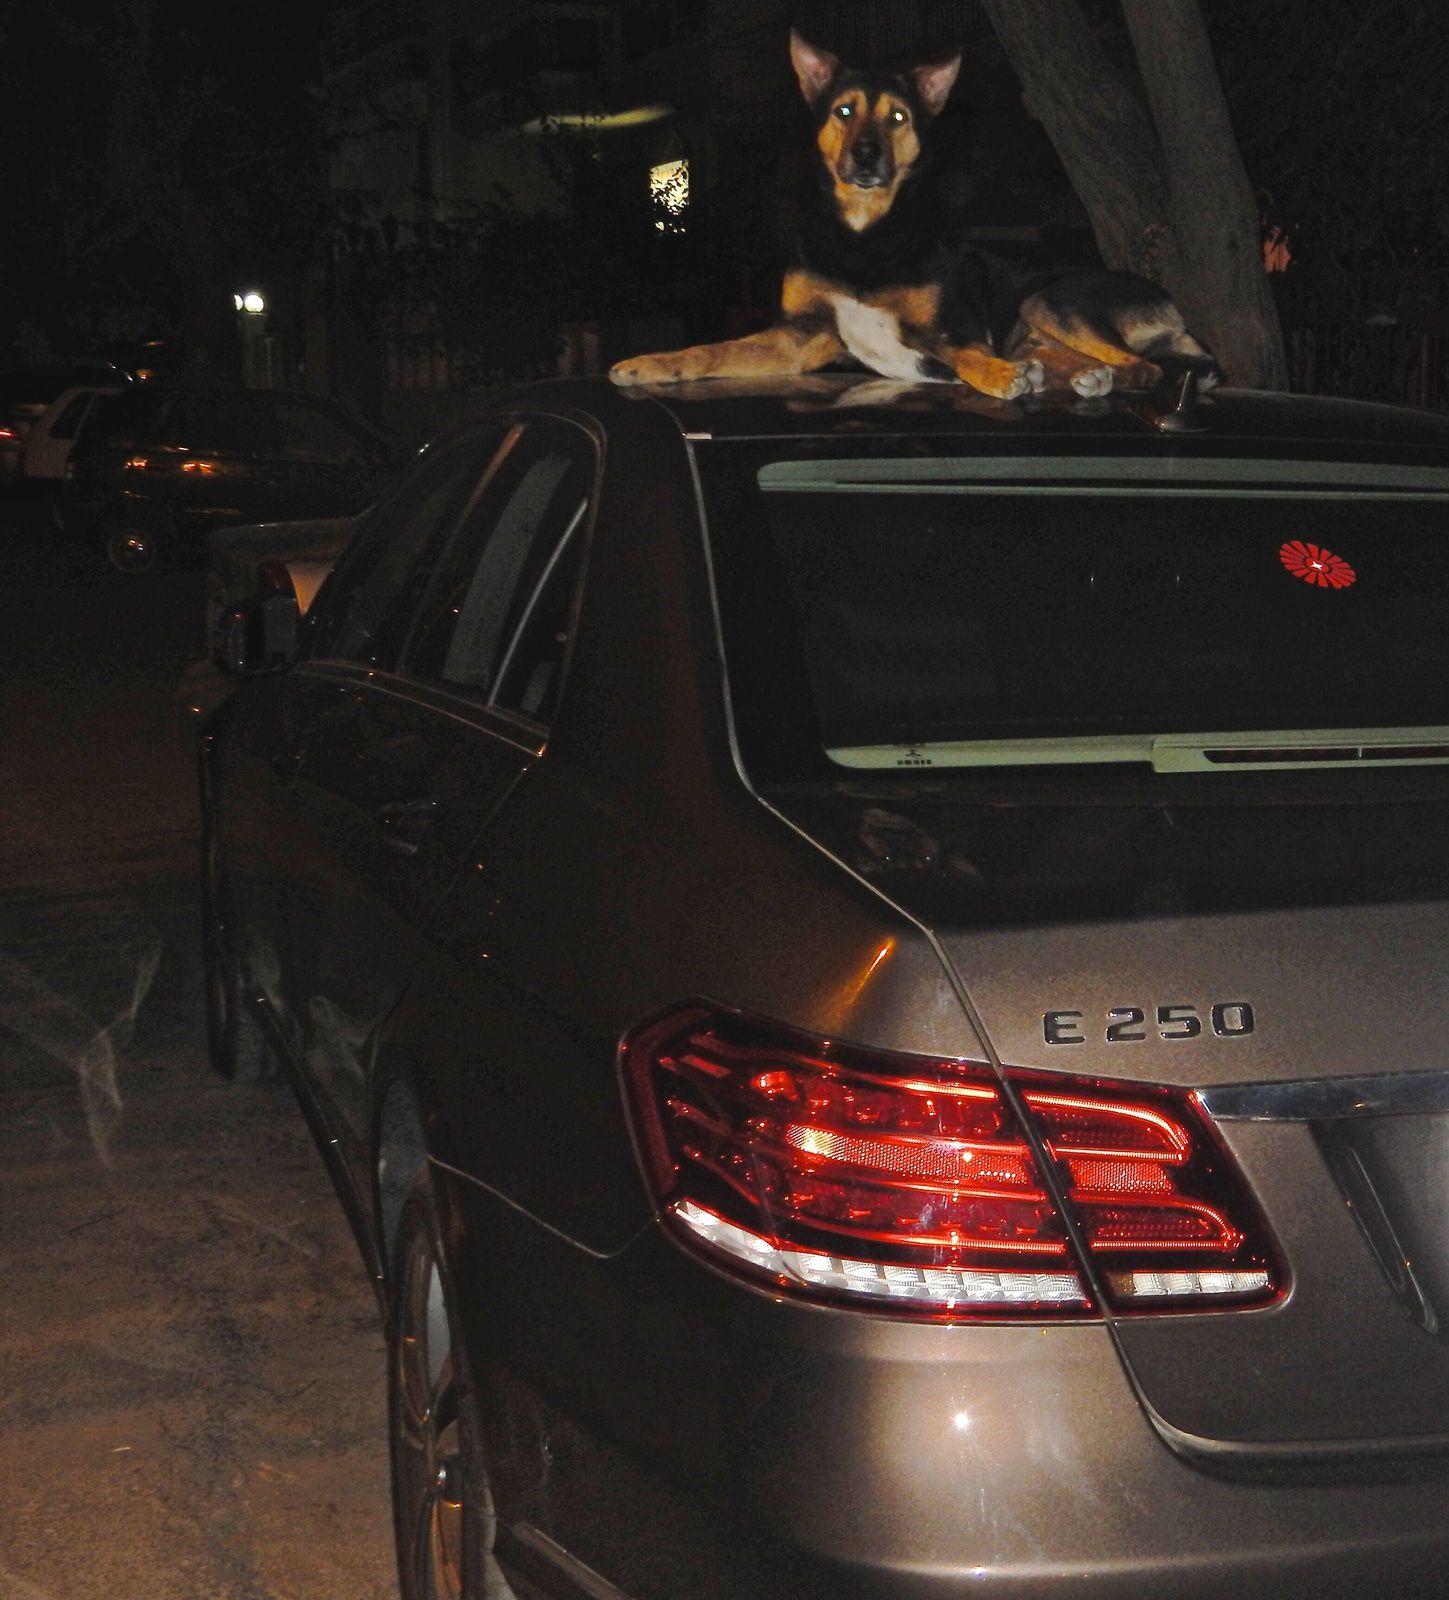 Une vie de chien, Delhi - Avril 2014